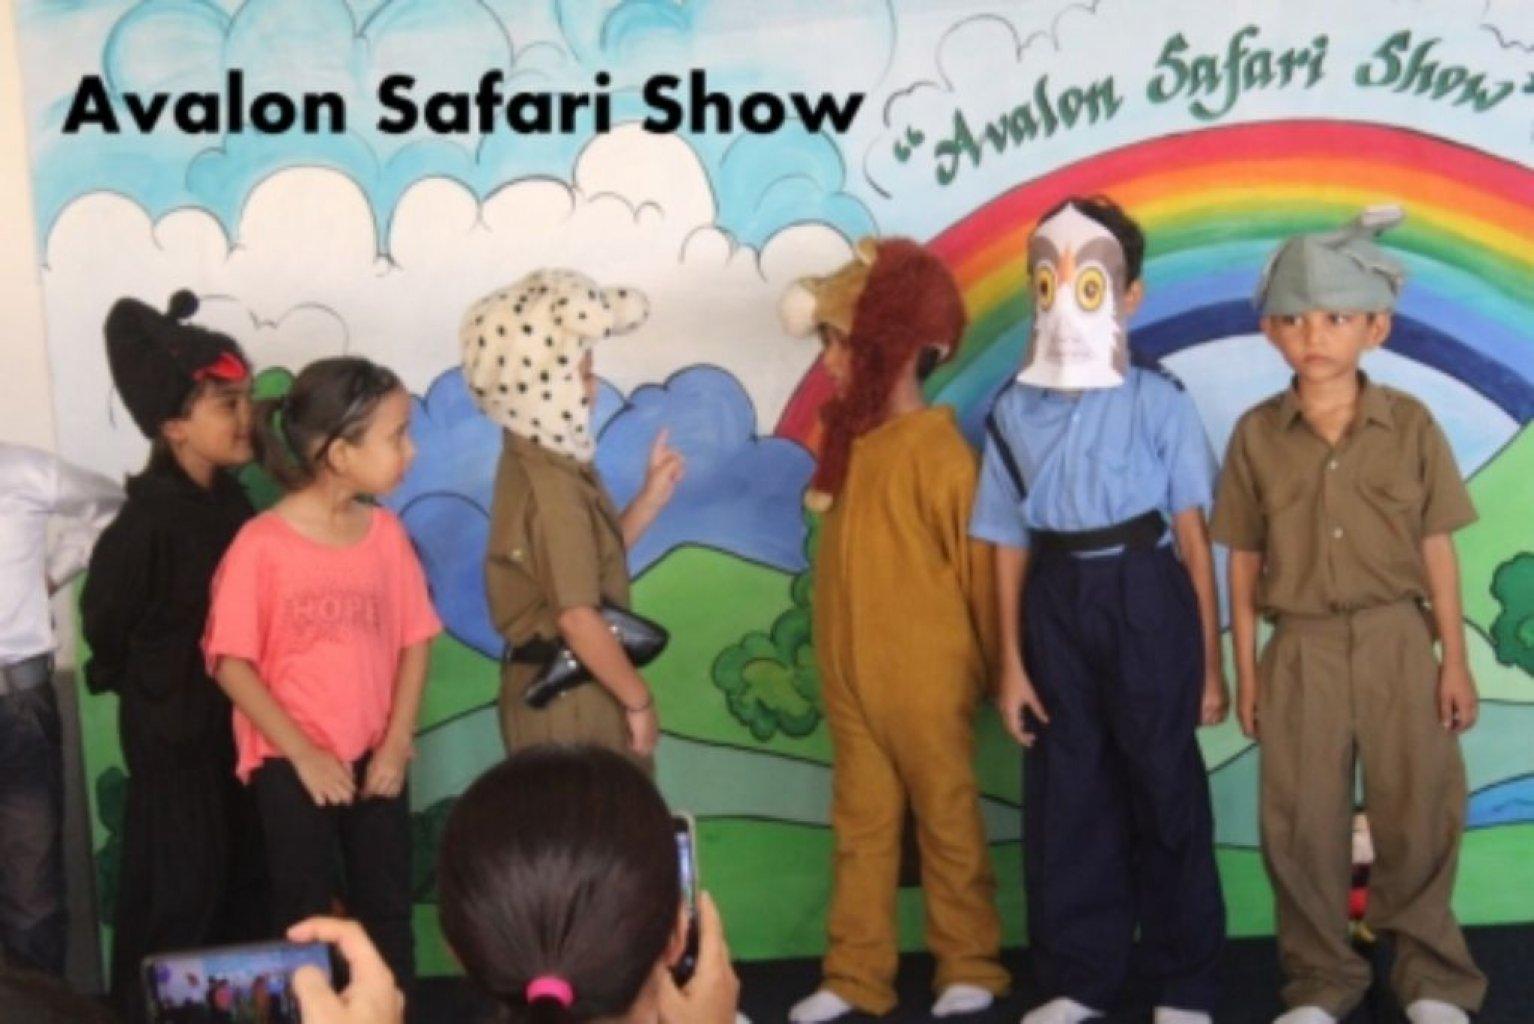 Avalon Safari Show